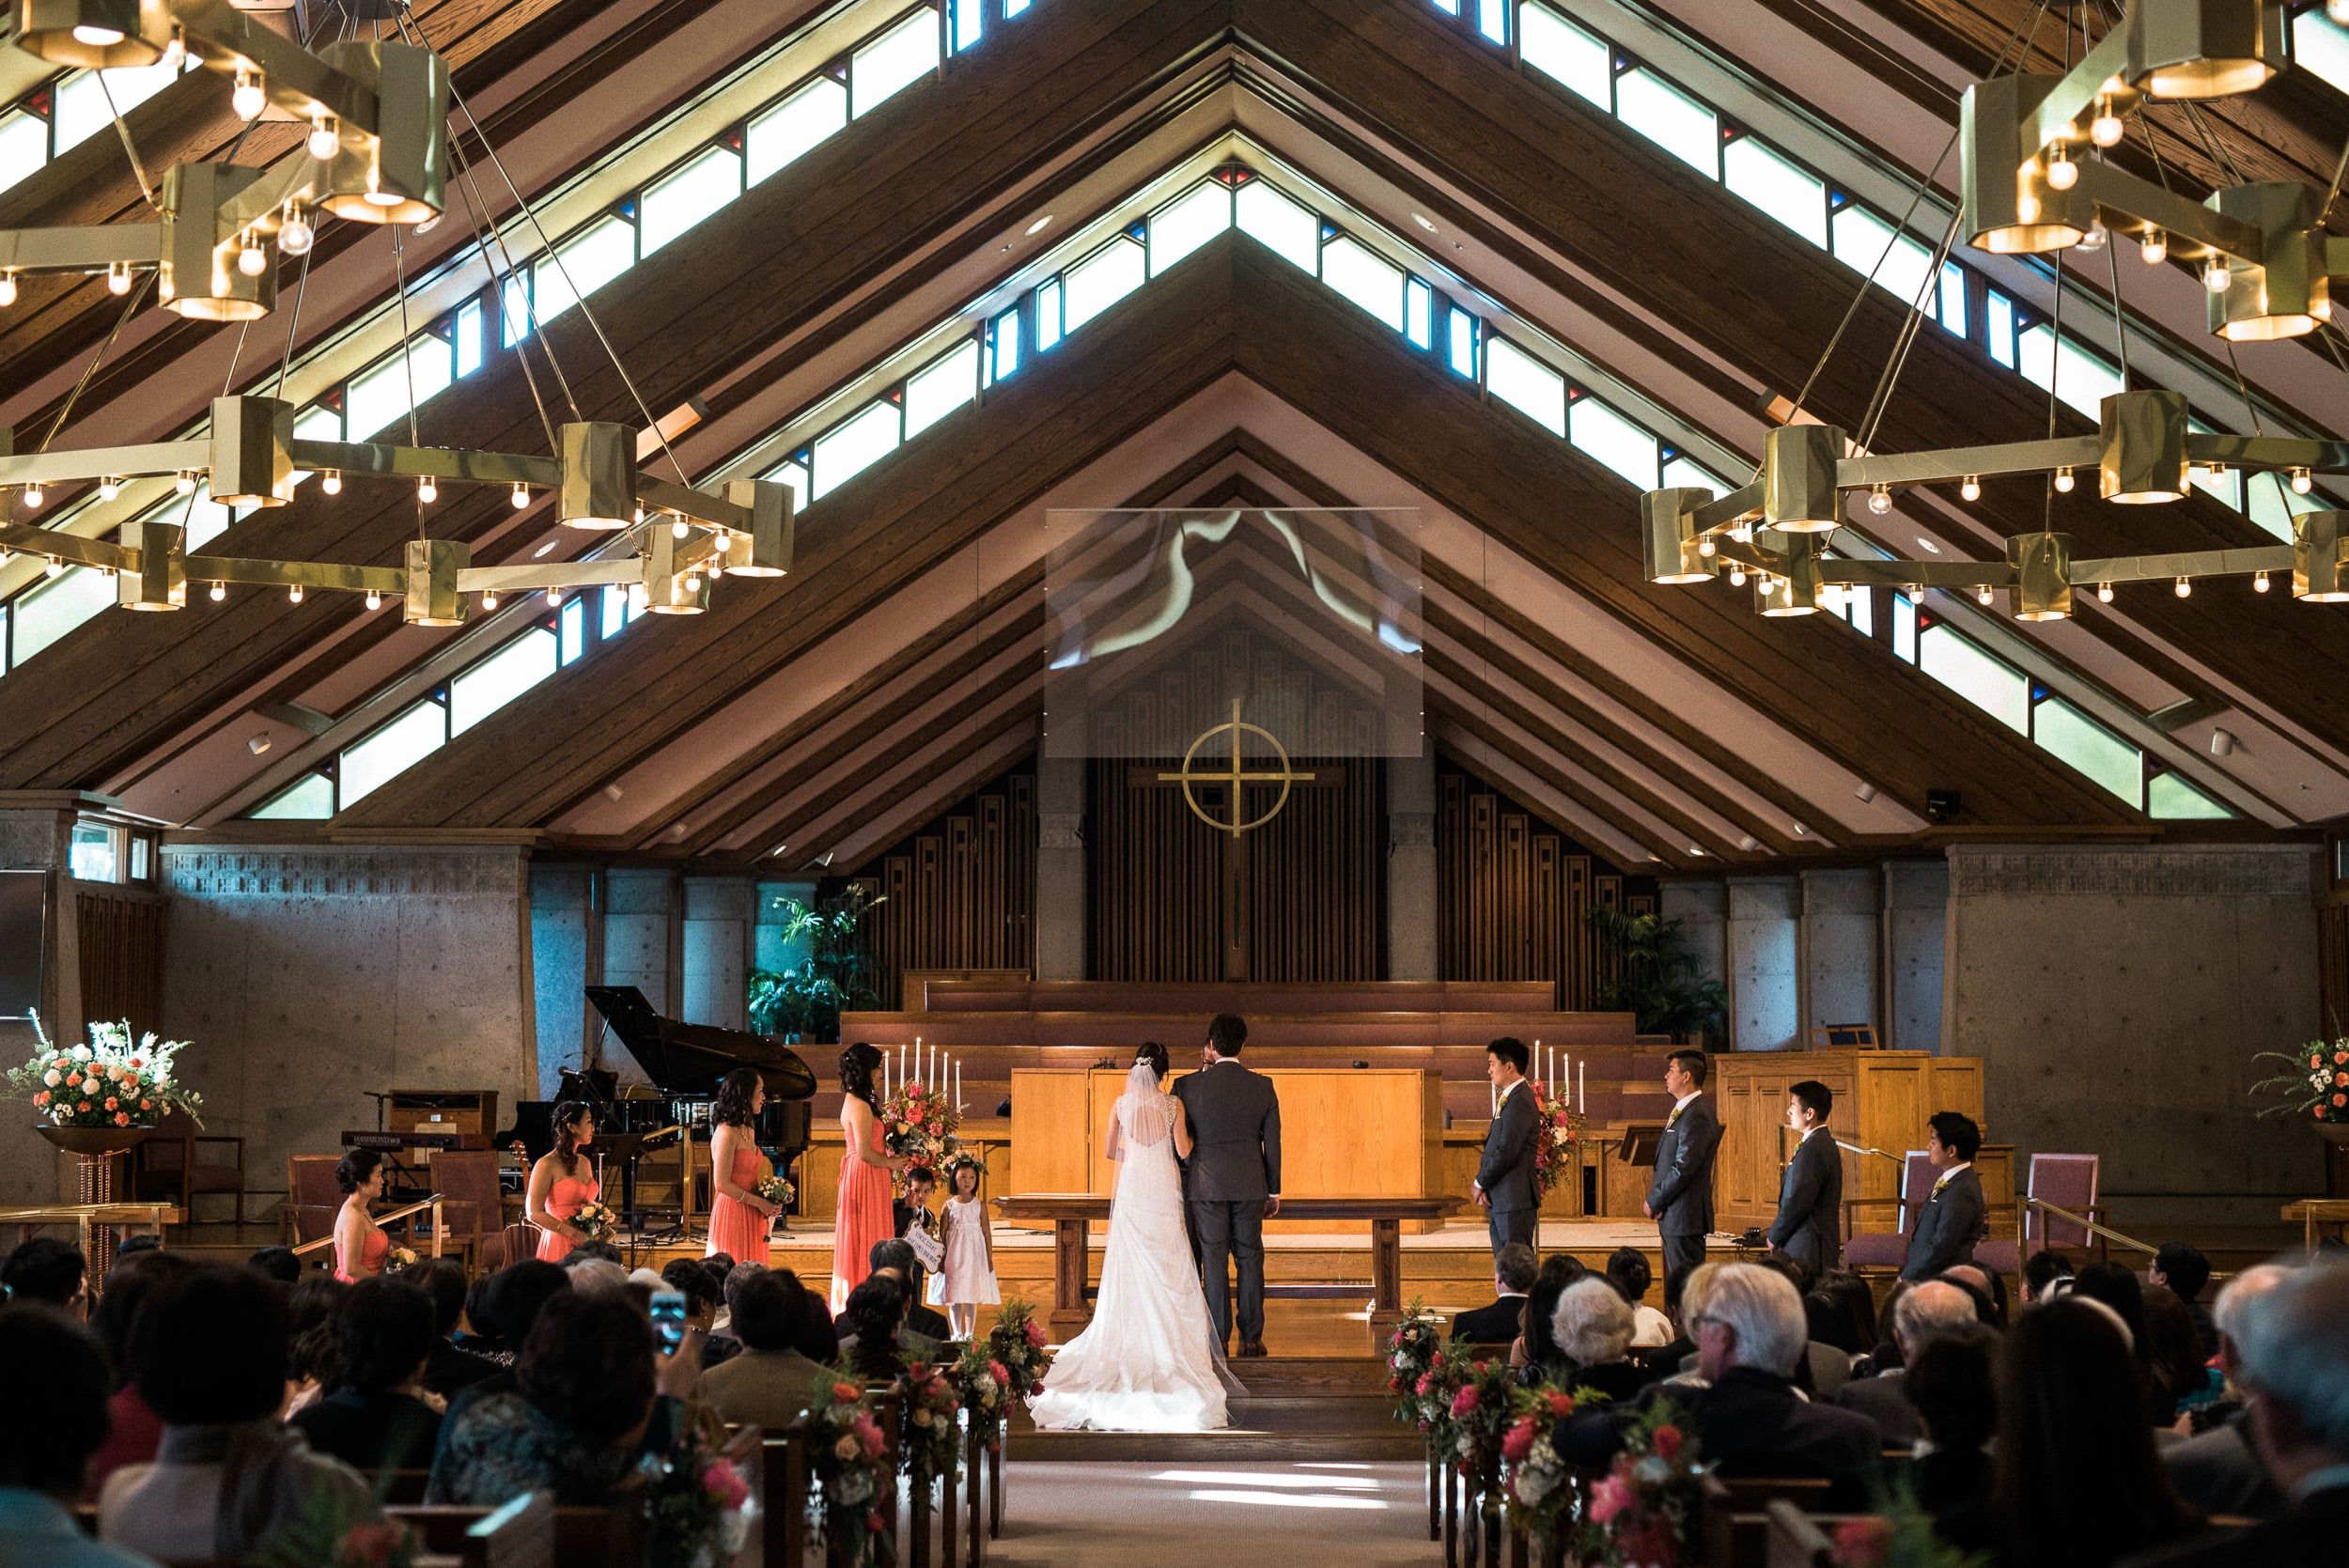 Moraga Valley Church wedding 035.jpg